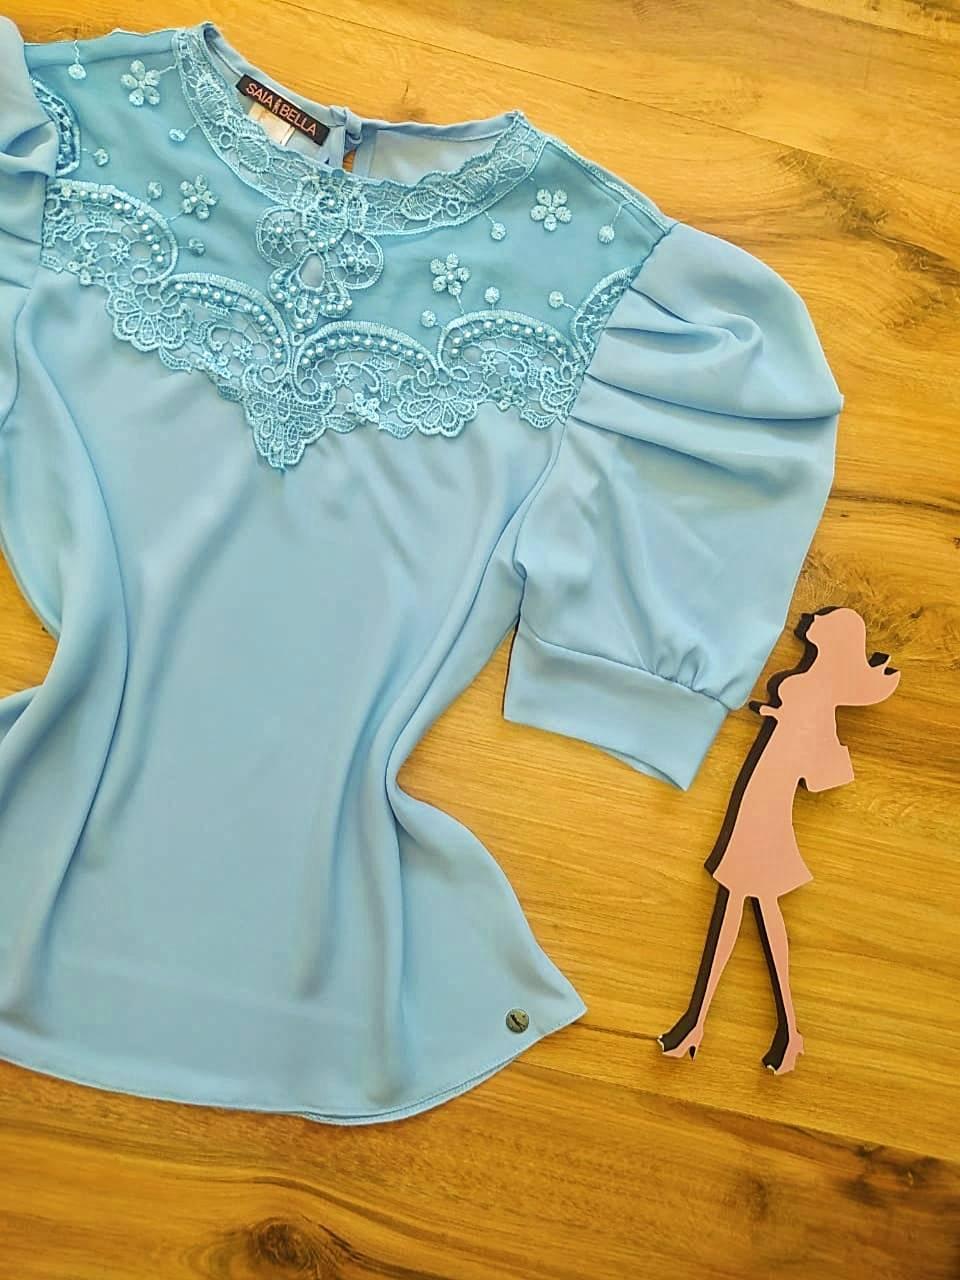 Blusa Dianna de Renda Saia Bella - SB840700 - Azul Bebê